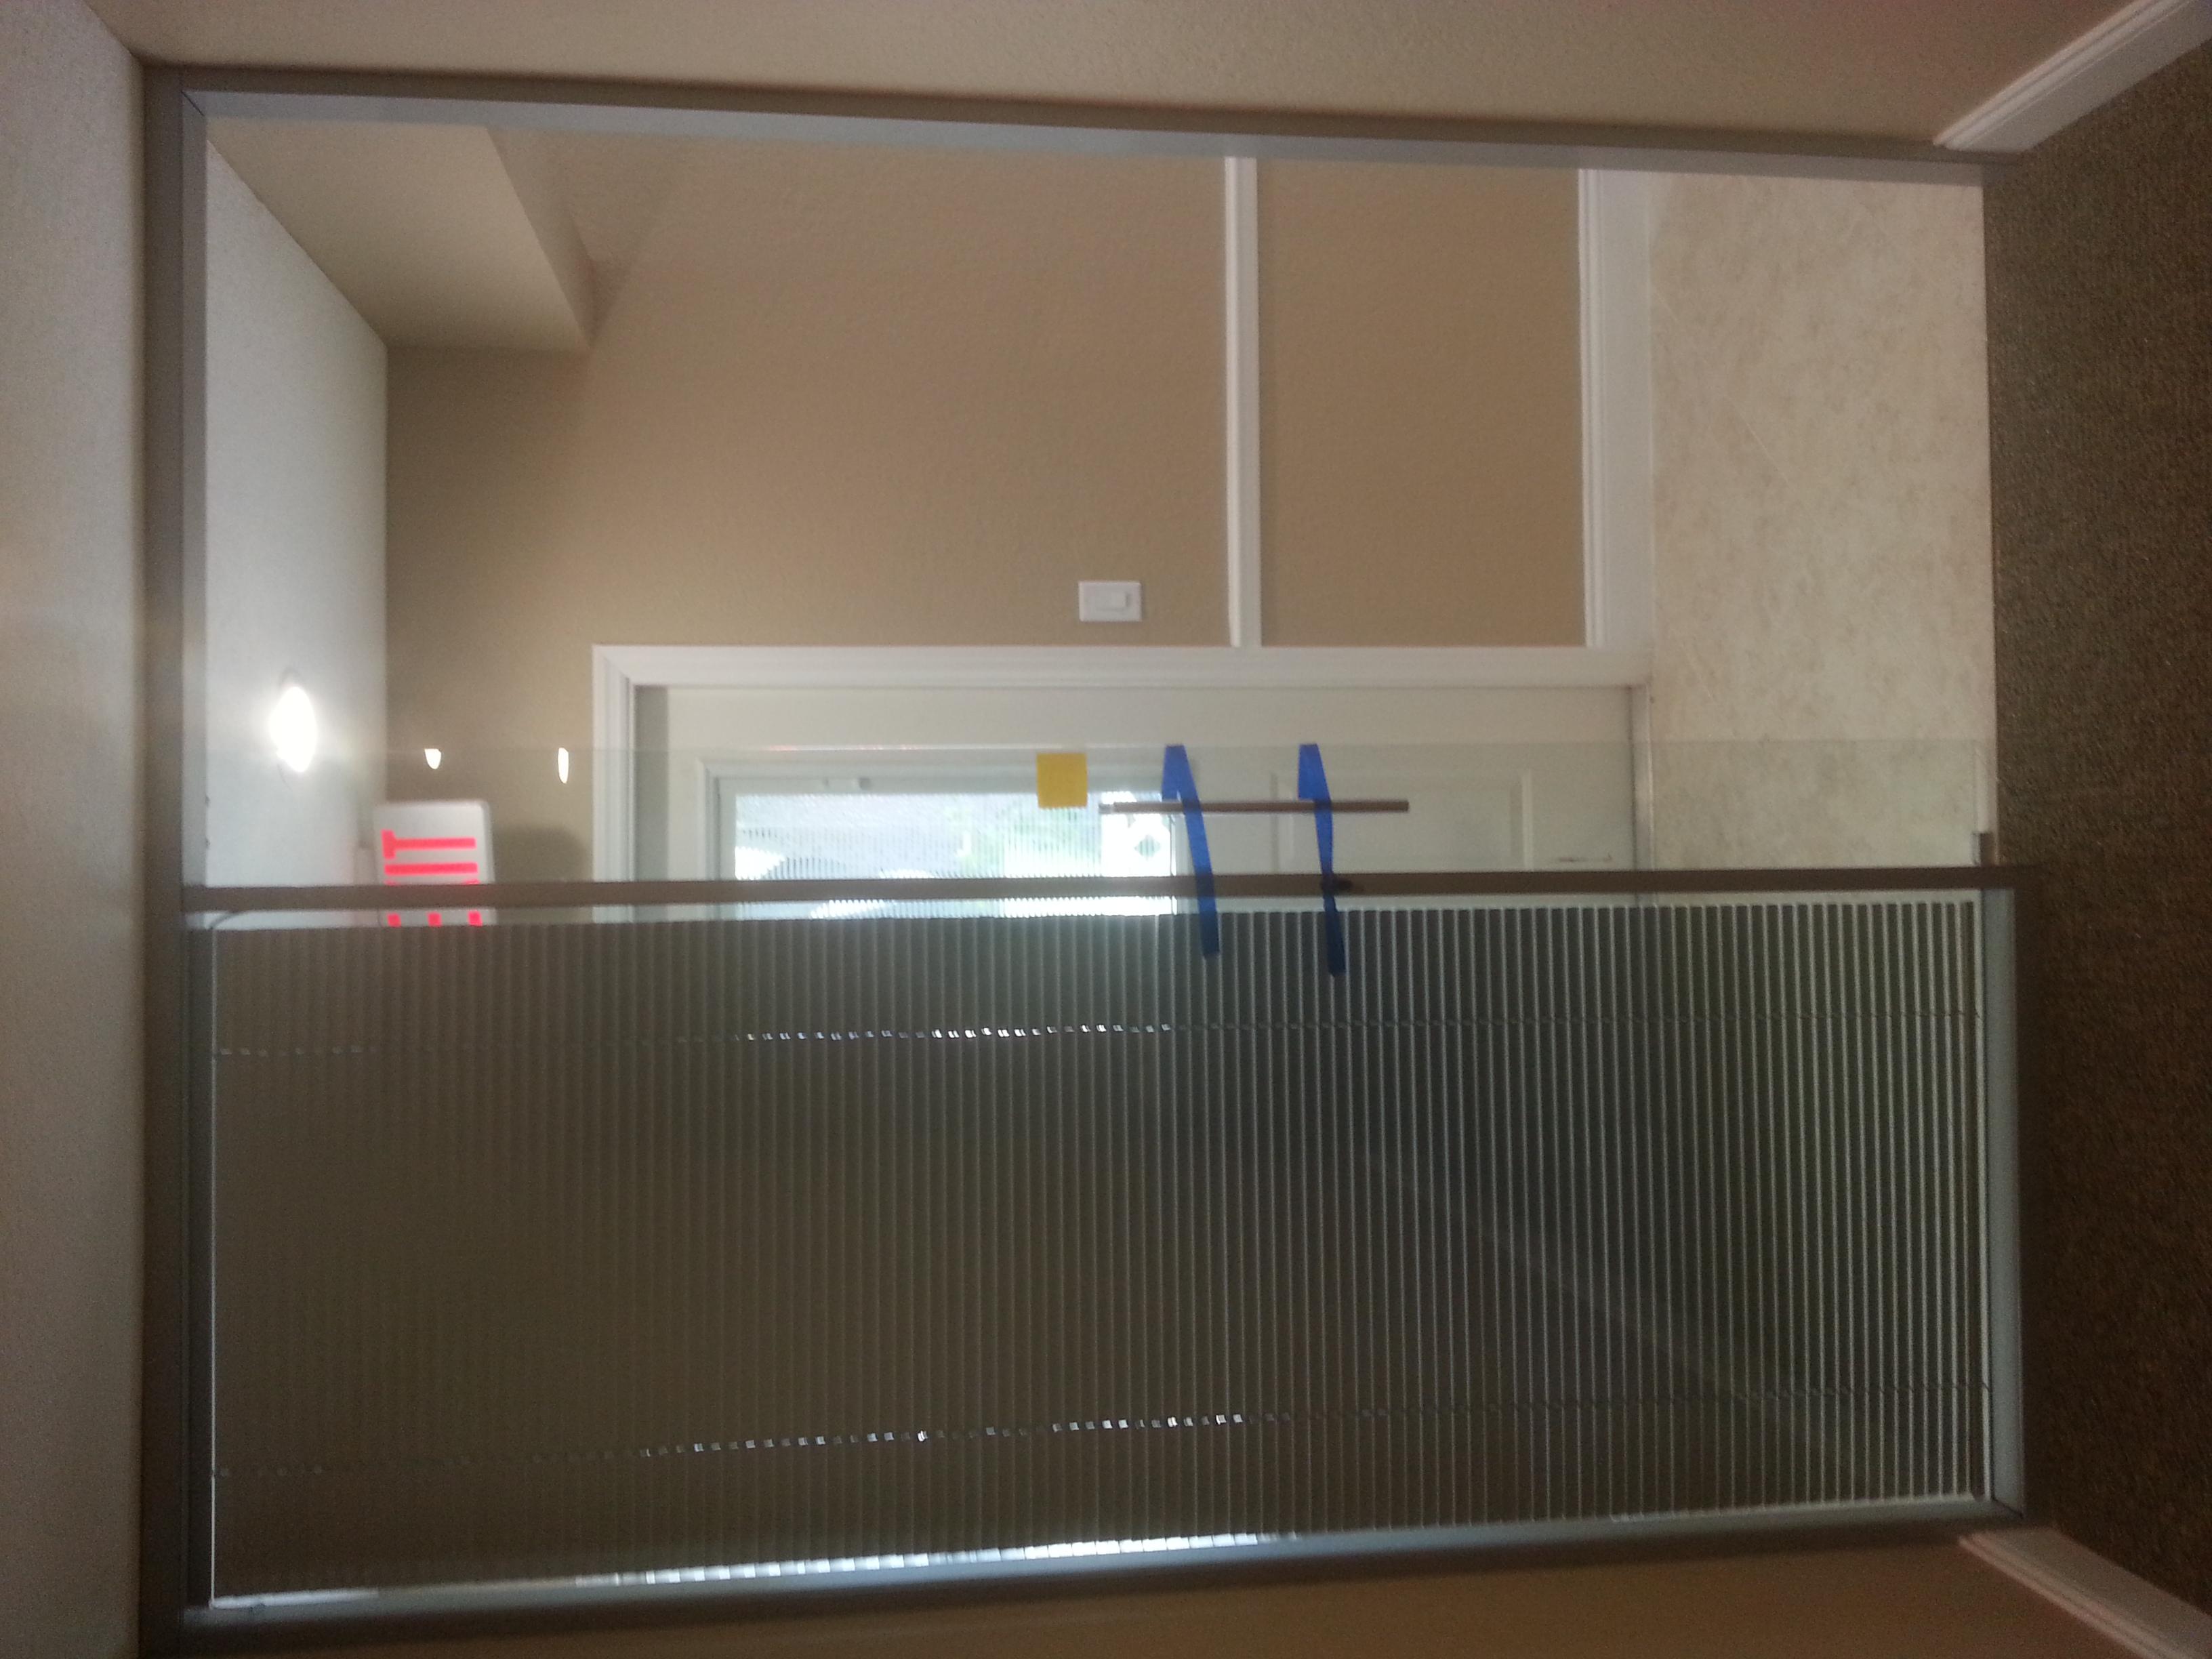 manasota-office-supplies-llc-20170320-172631-3-.jpg